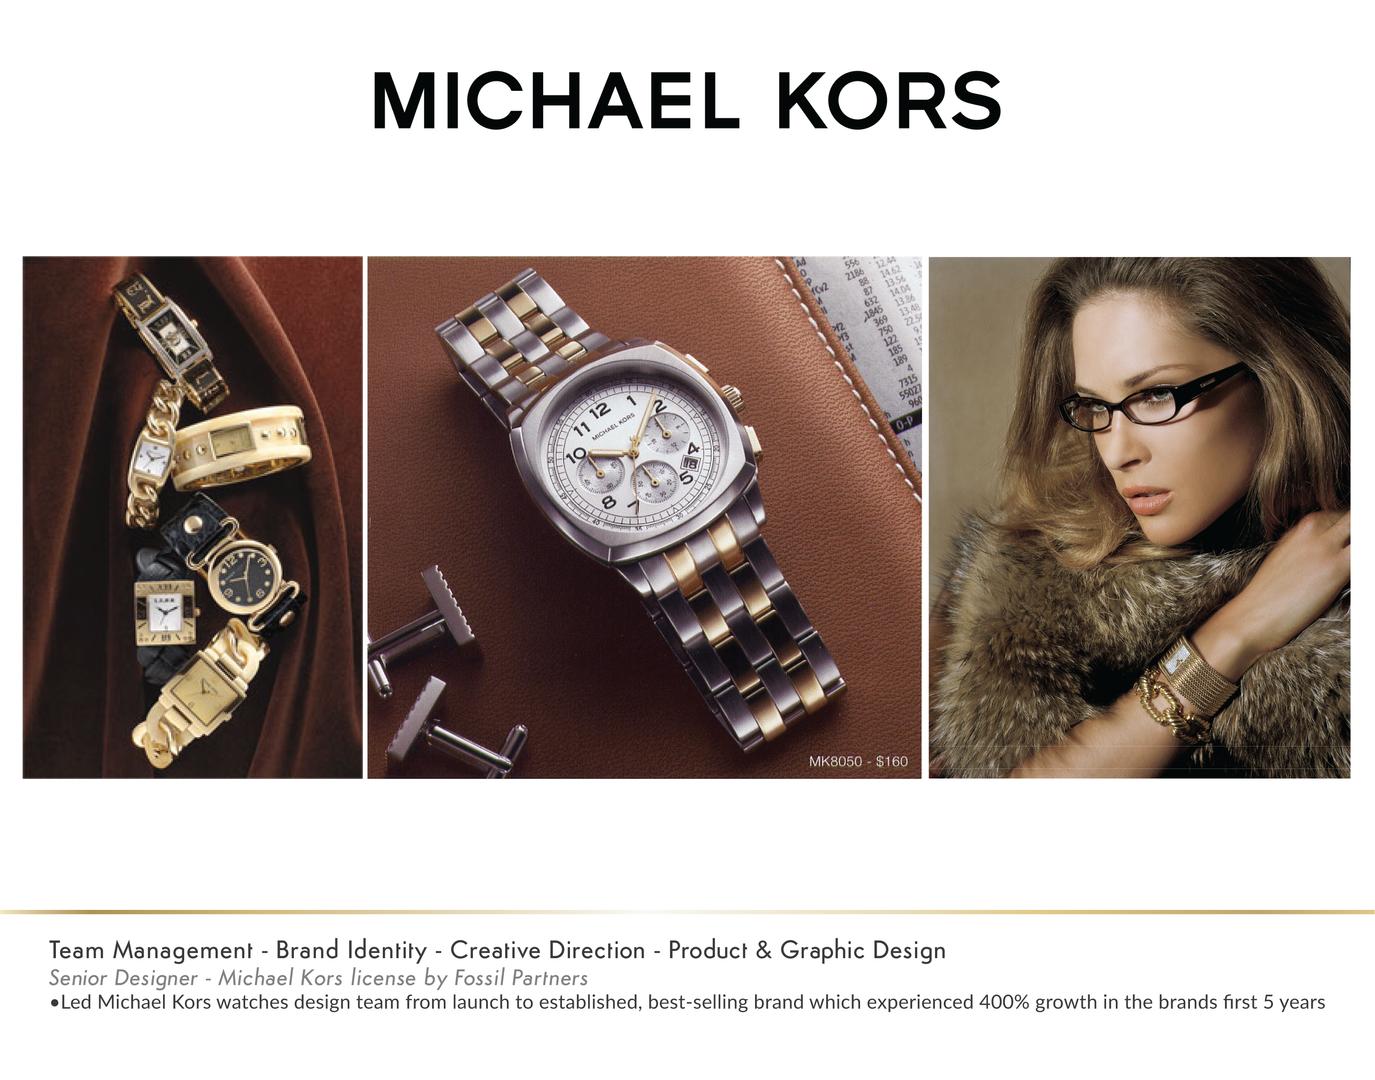 Michael Kors Watch Adverstisments